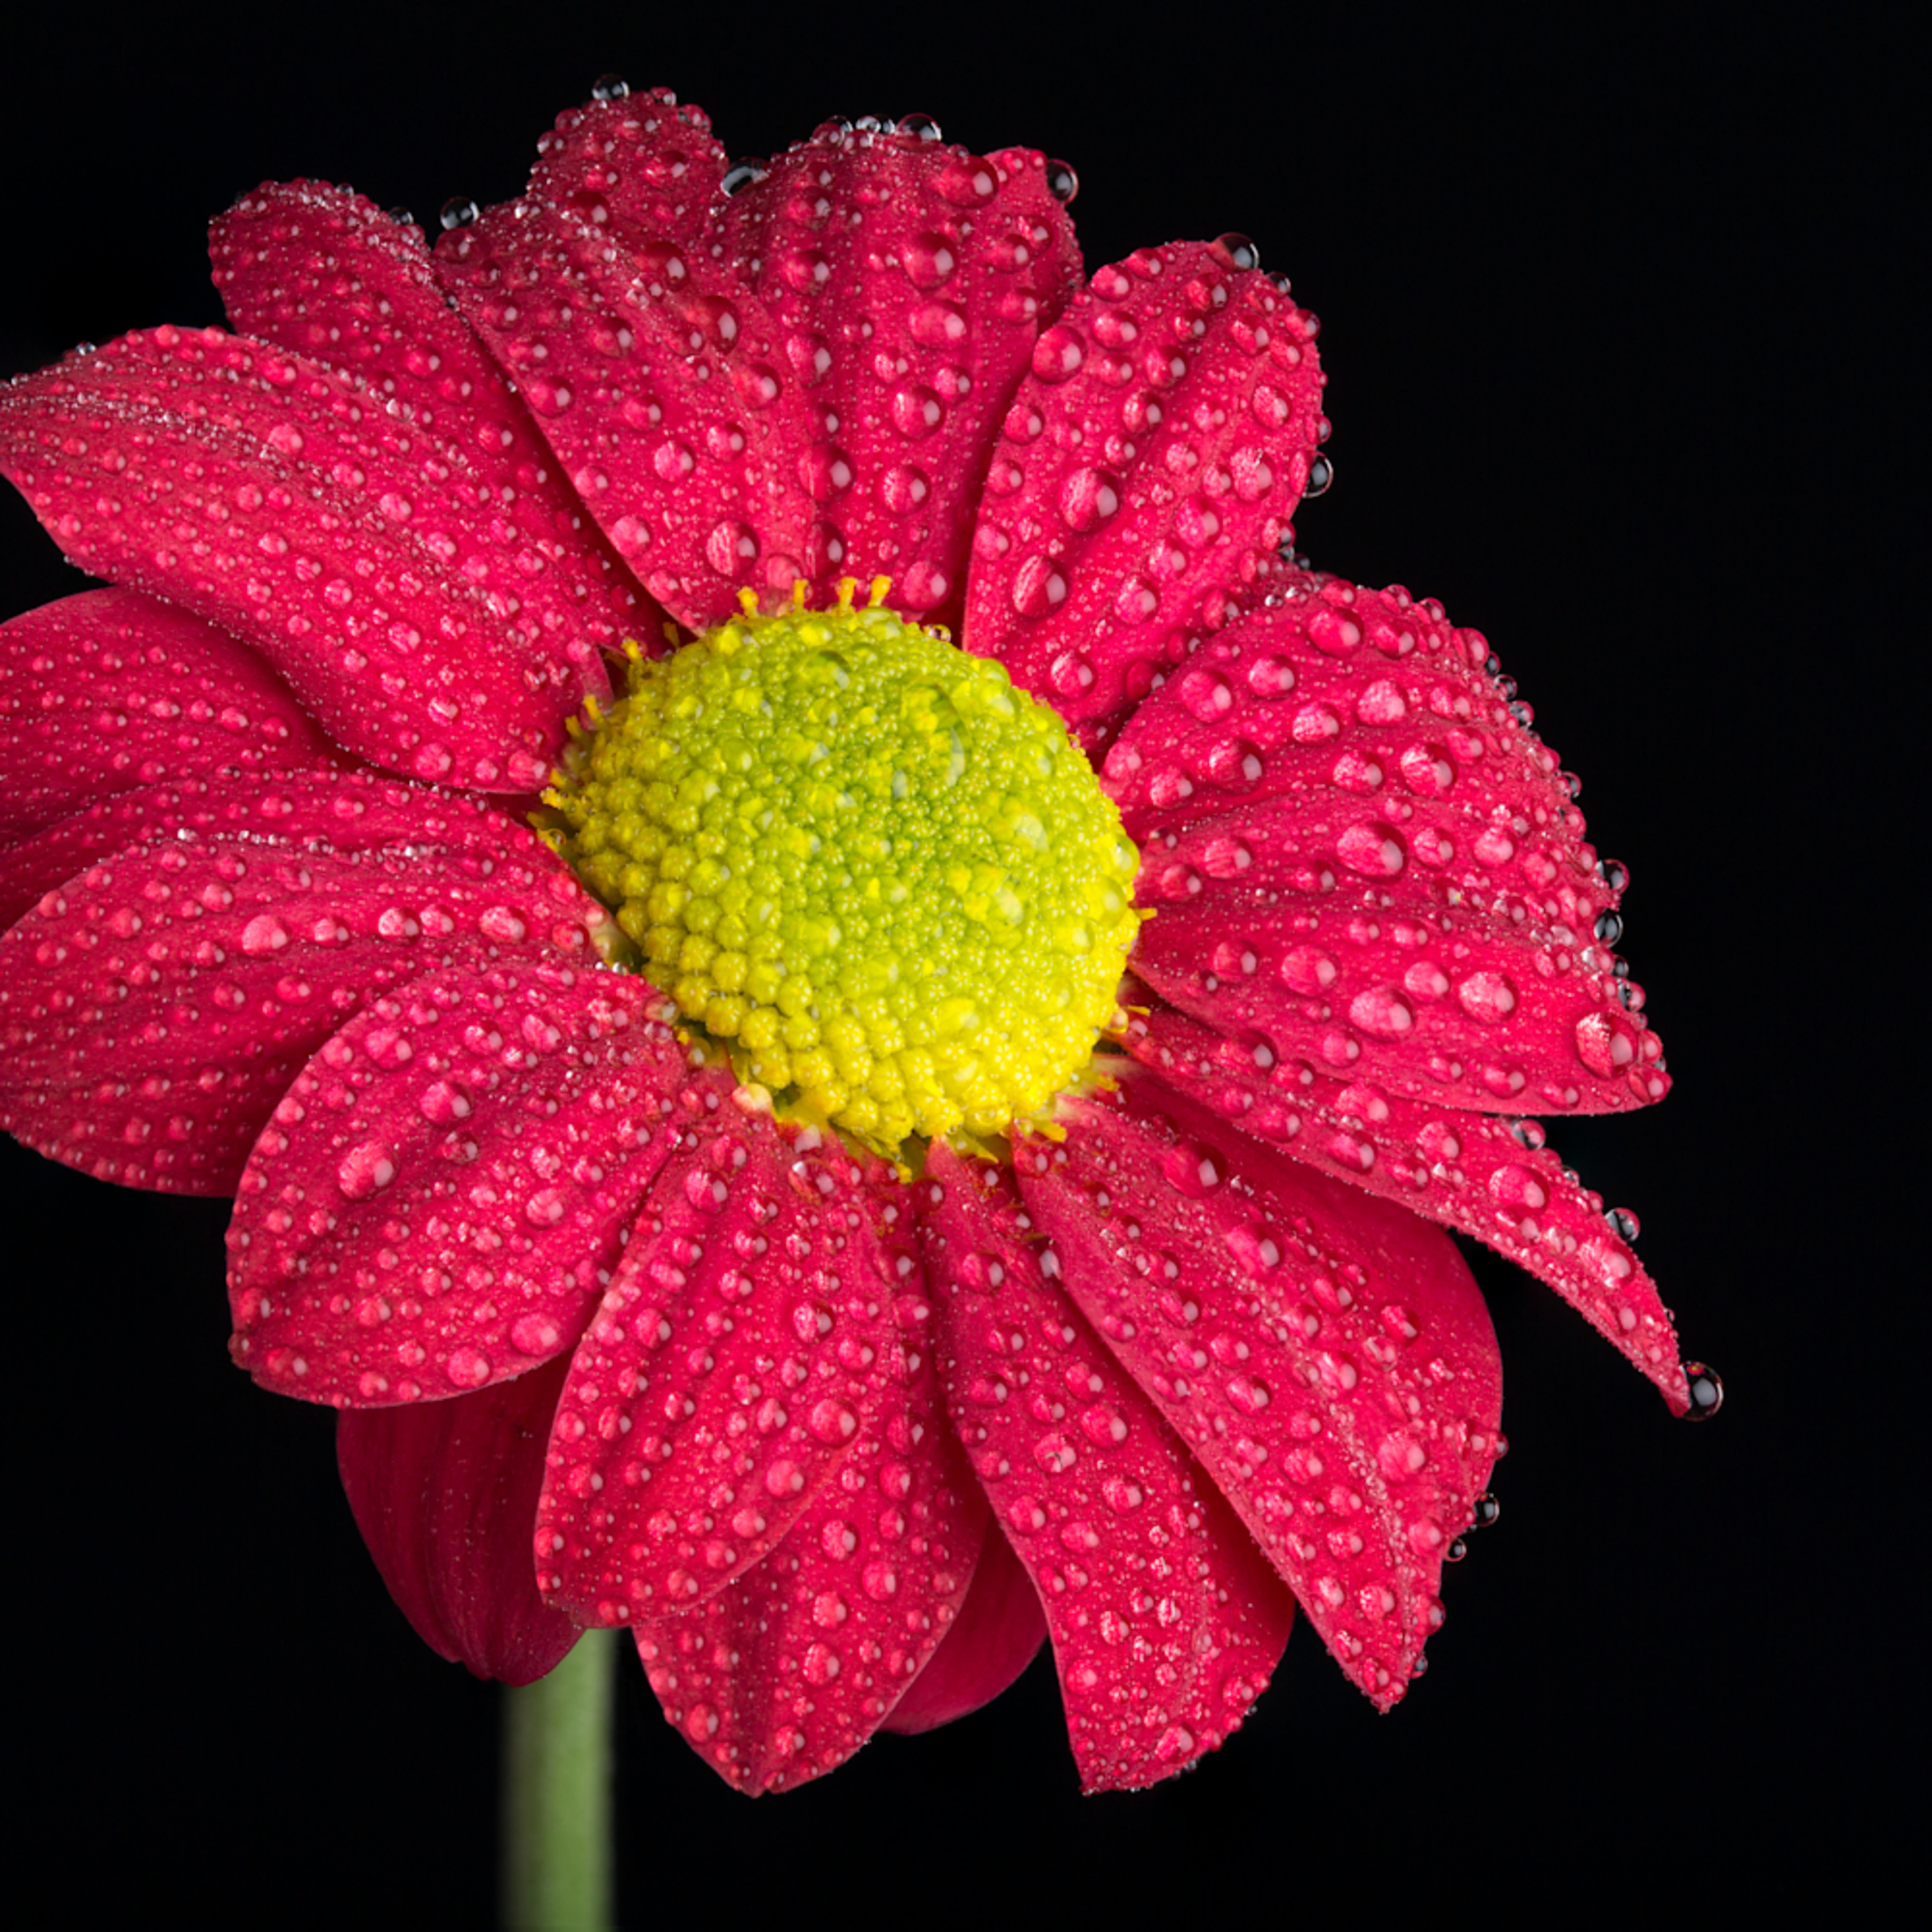 Mbp flower 20130423 96183 lpkhrb